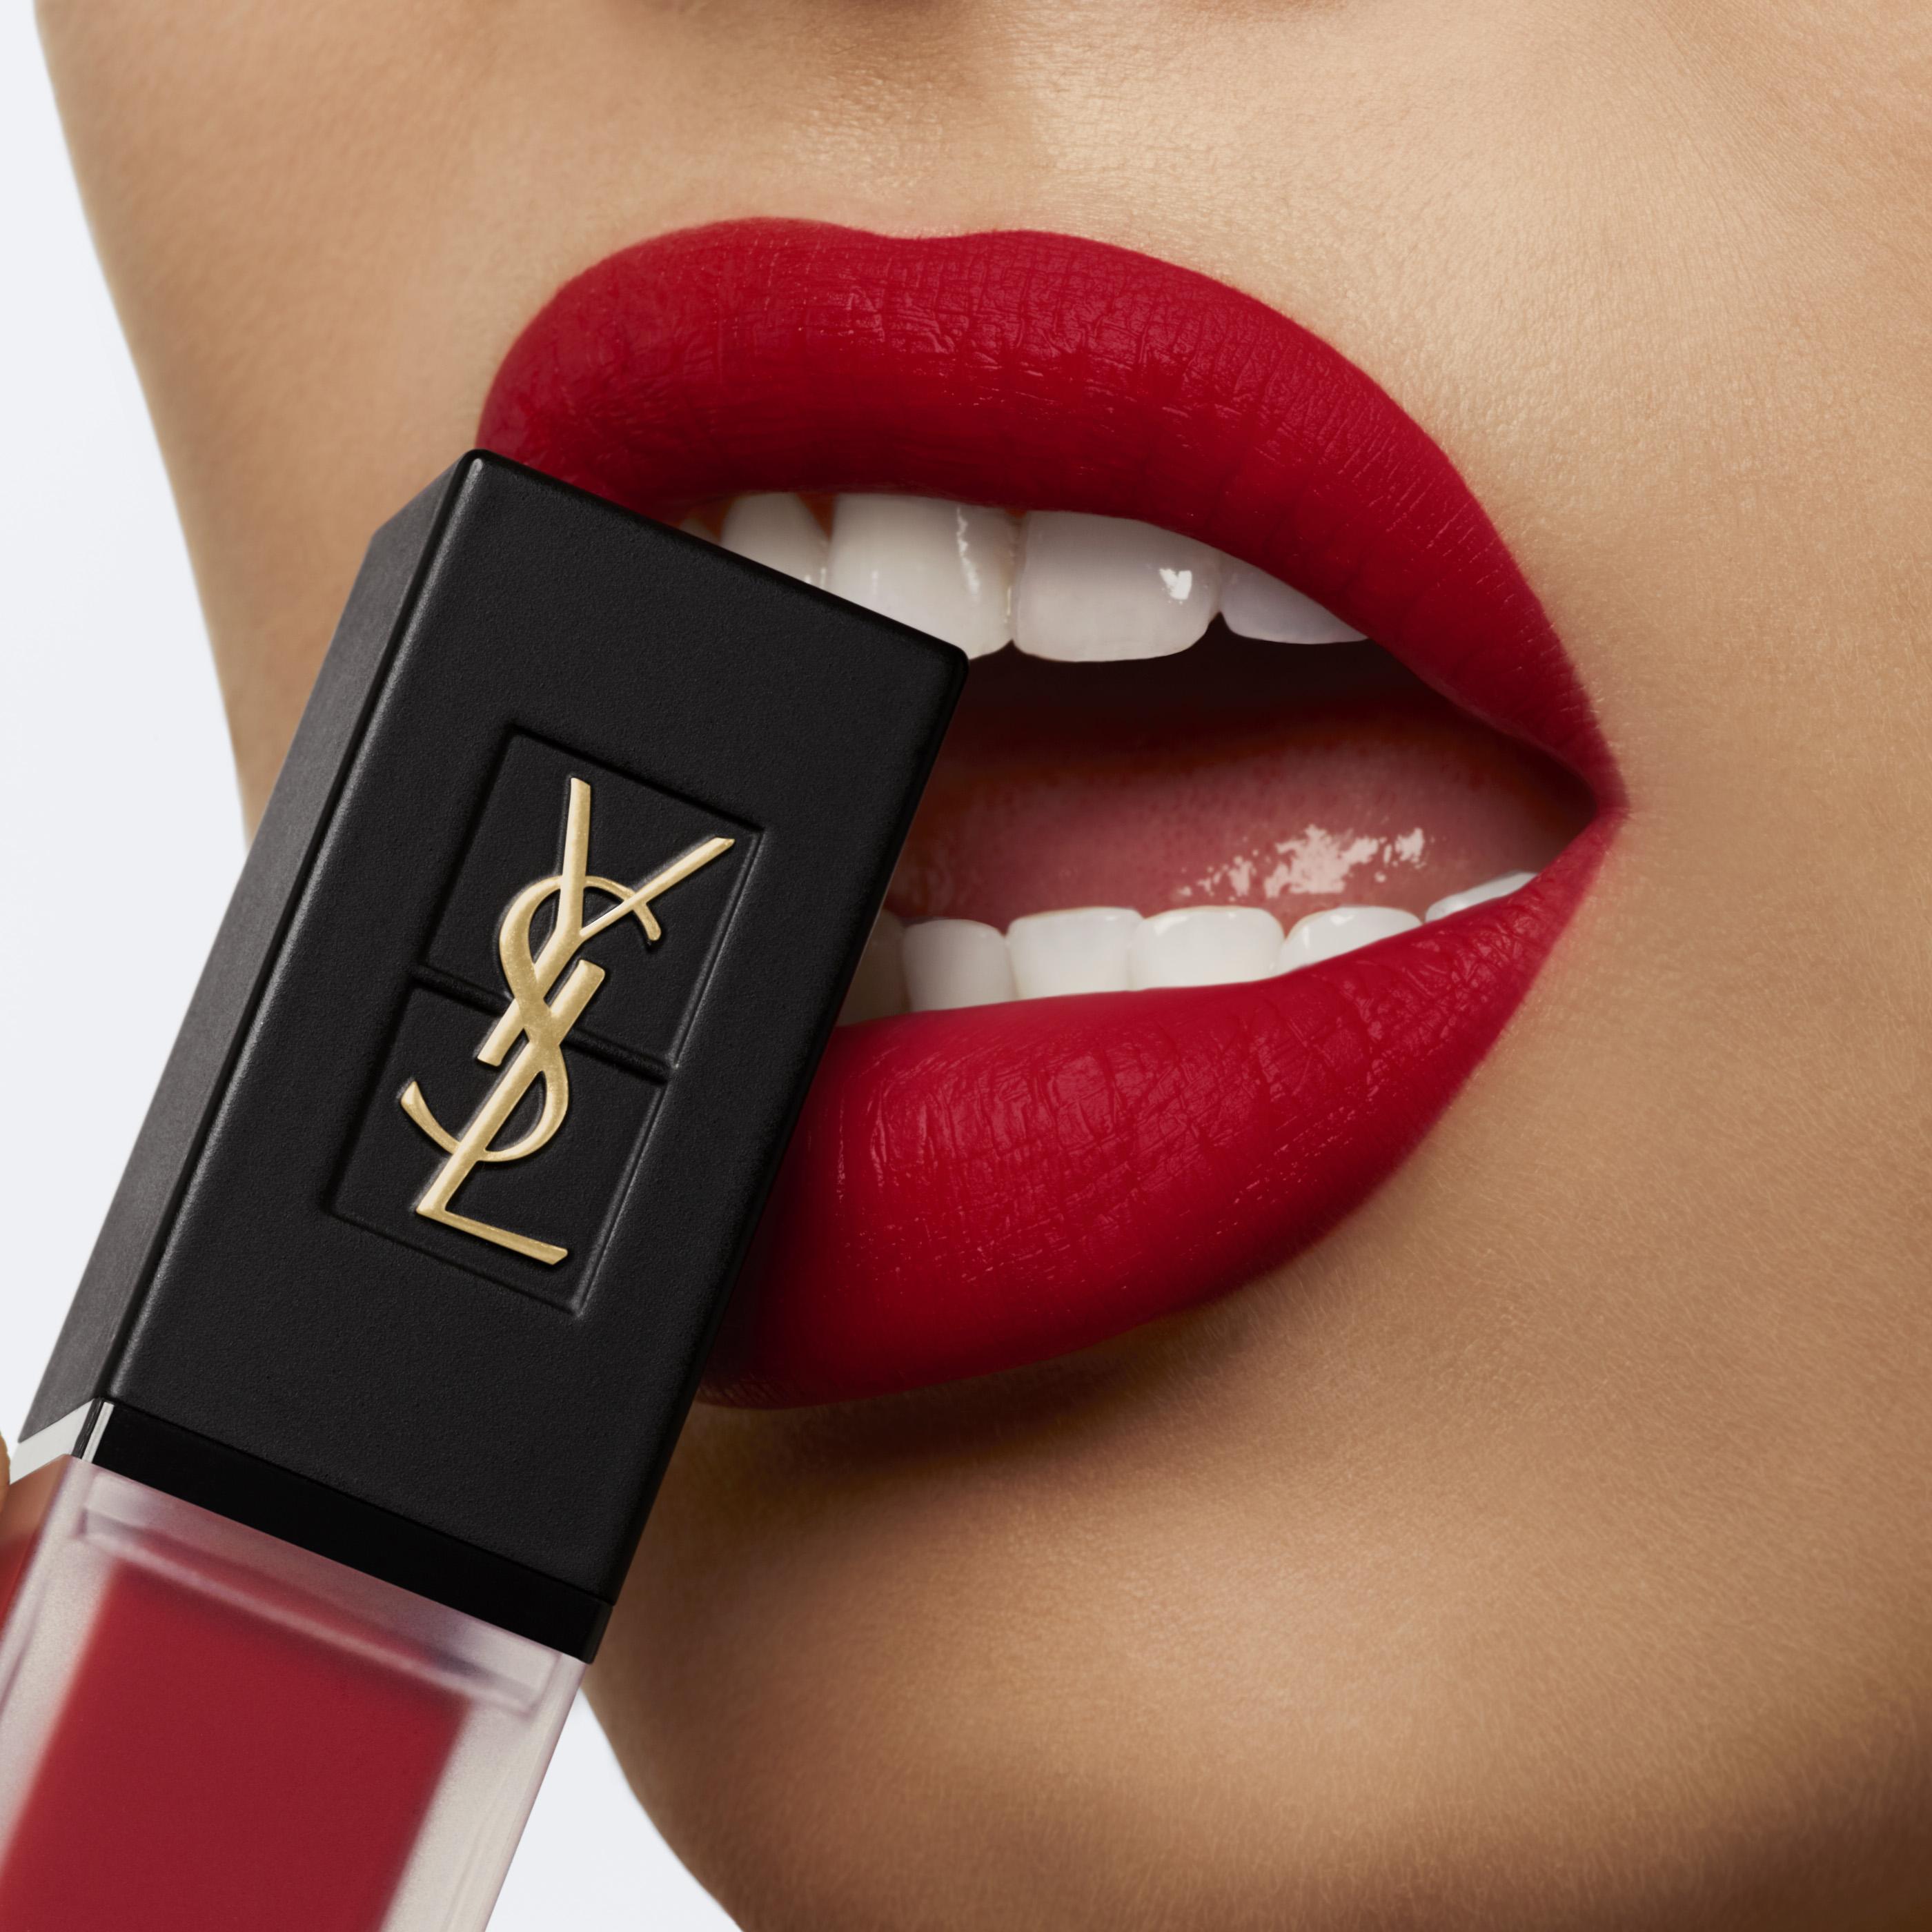 Yves Saint Laurent Tatouage Couture Velvet Lip, 205